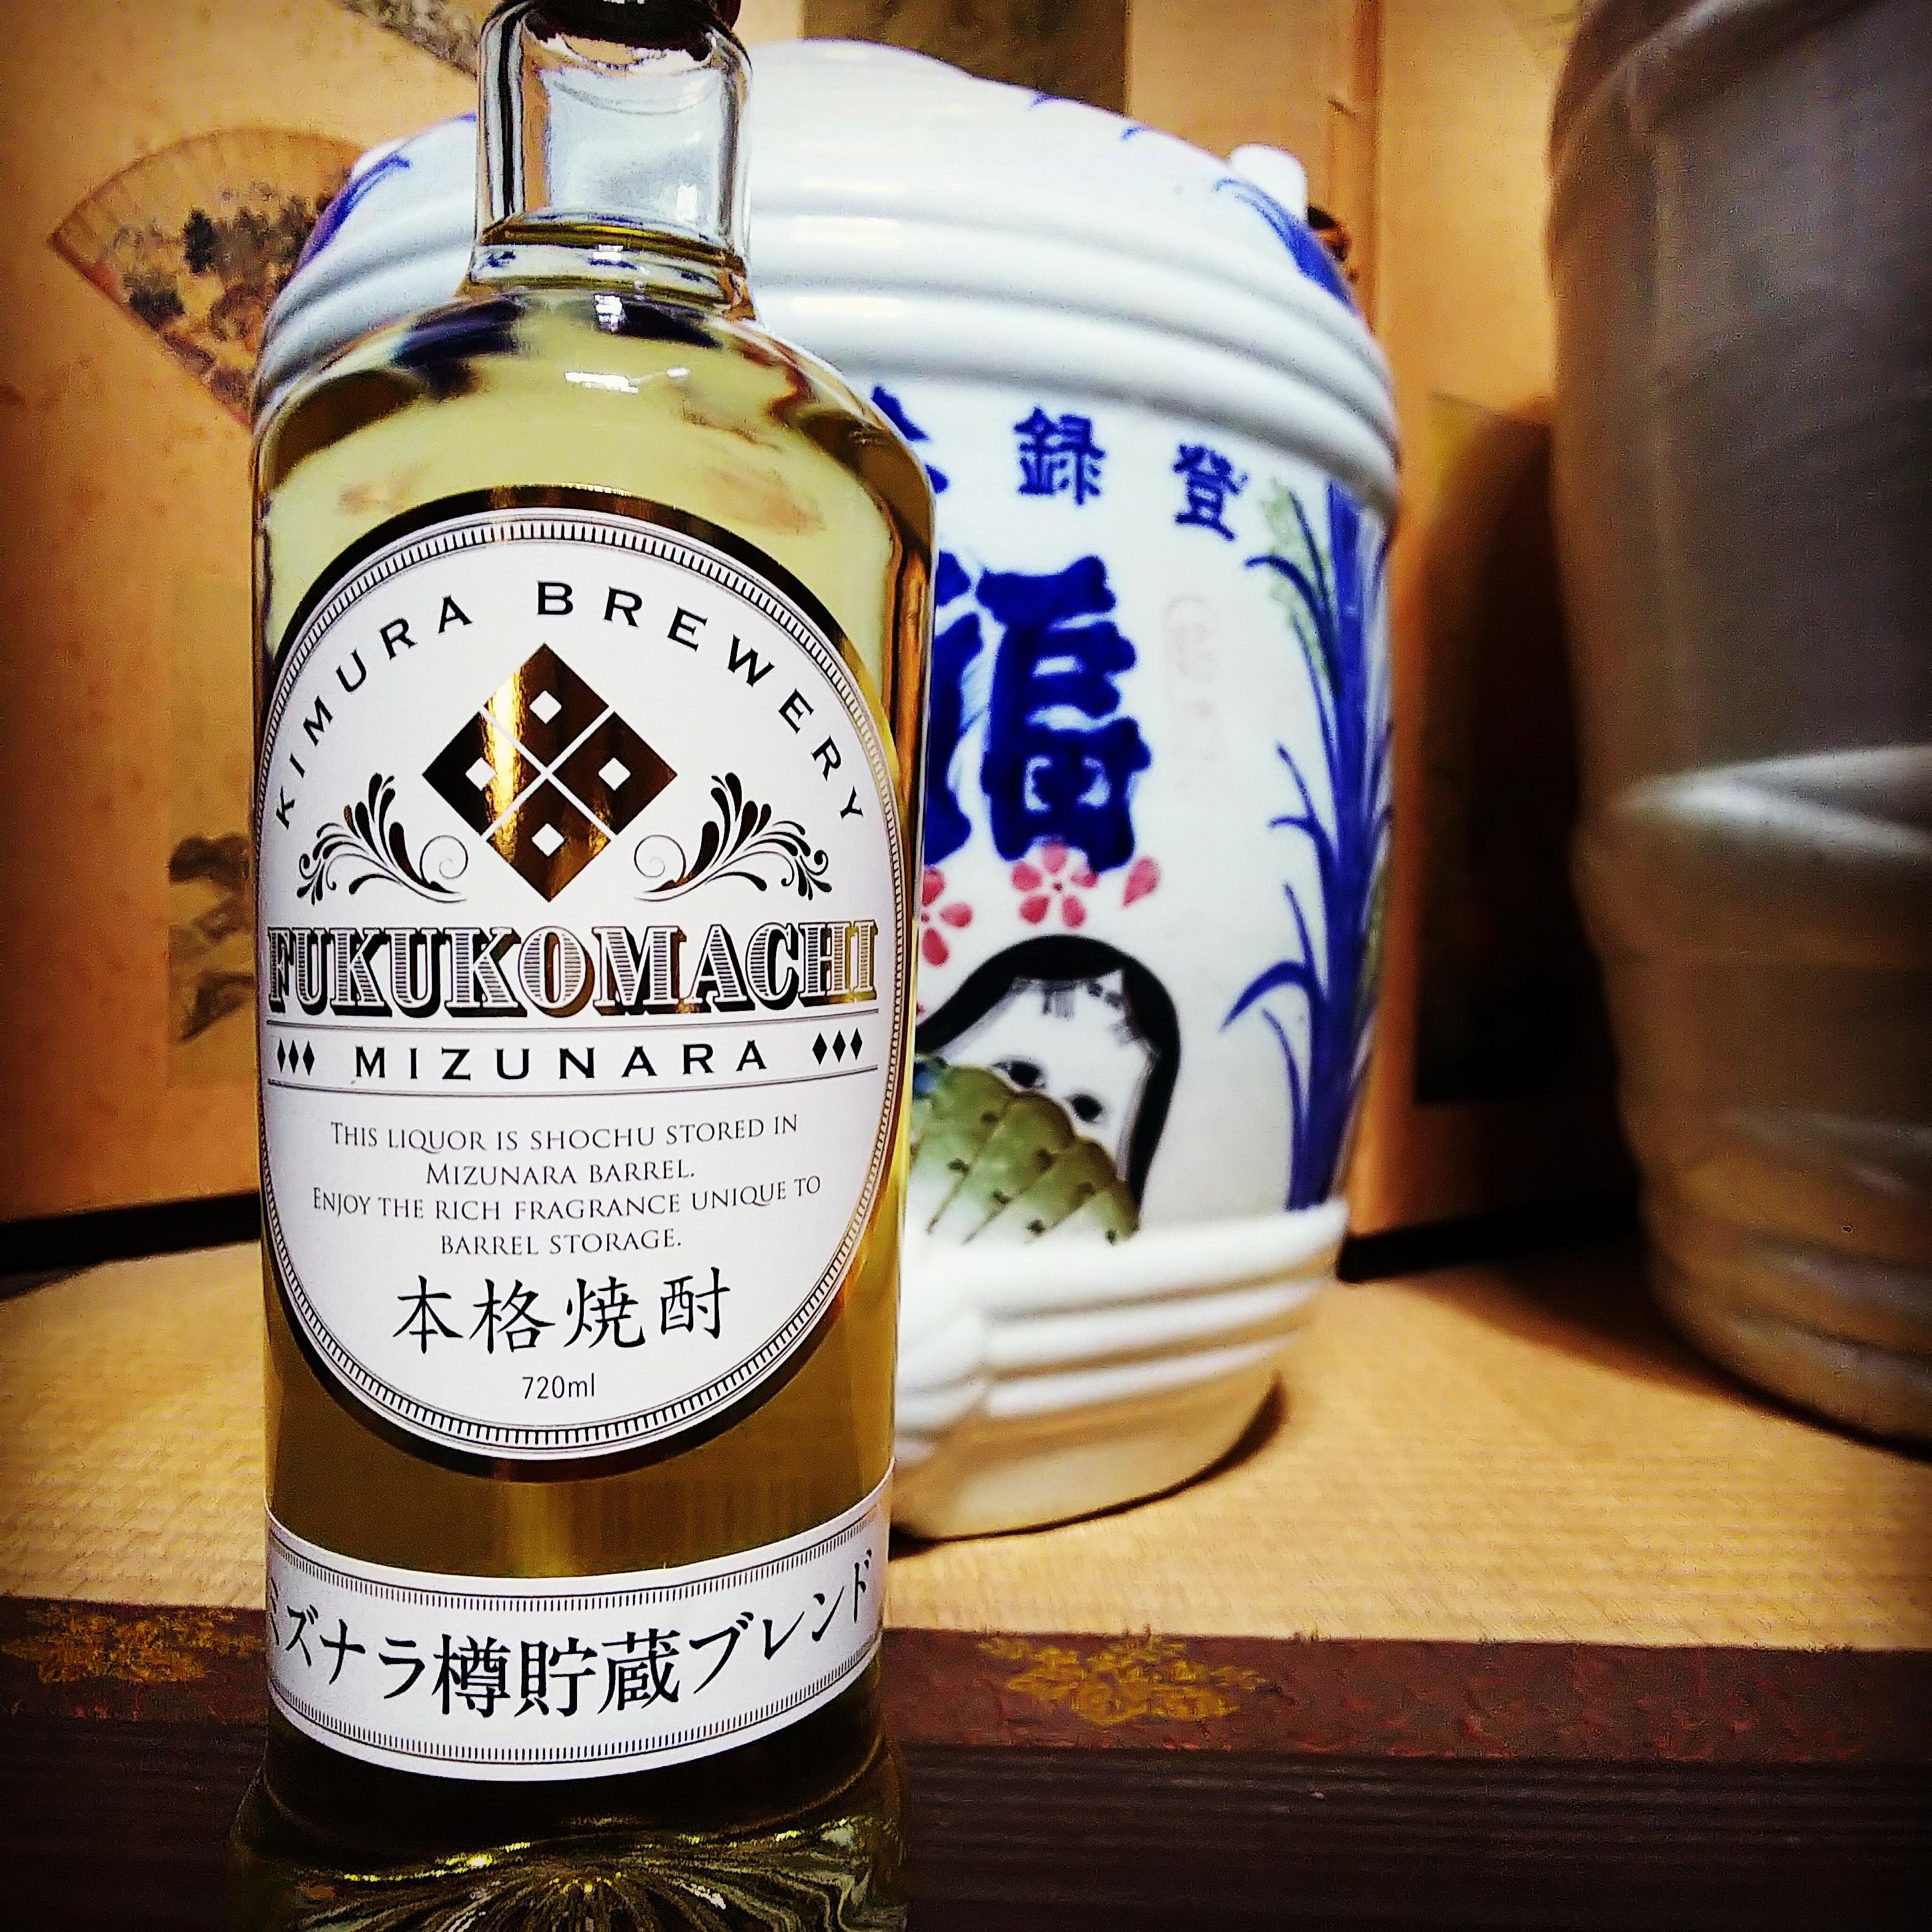 http://www.fukukomachi.com/blog/photo/IMG_20200611_092402_156.jpg